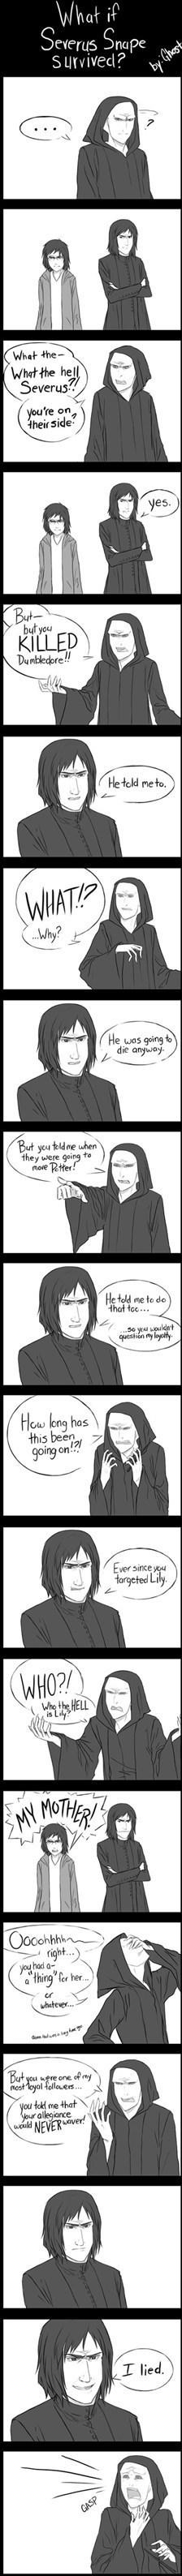 Harry Potter Severus Snape funny - 7454670080